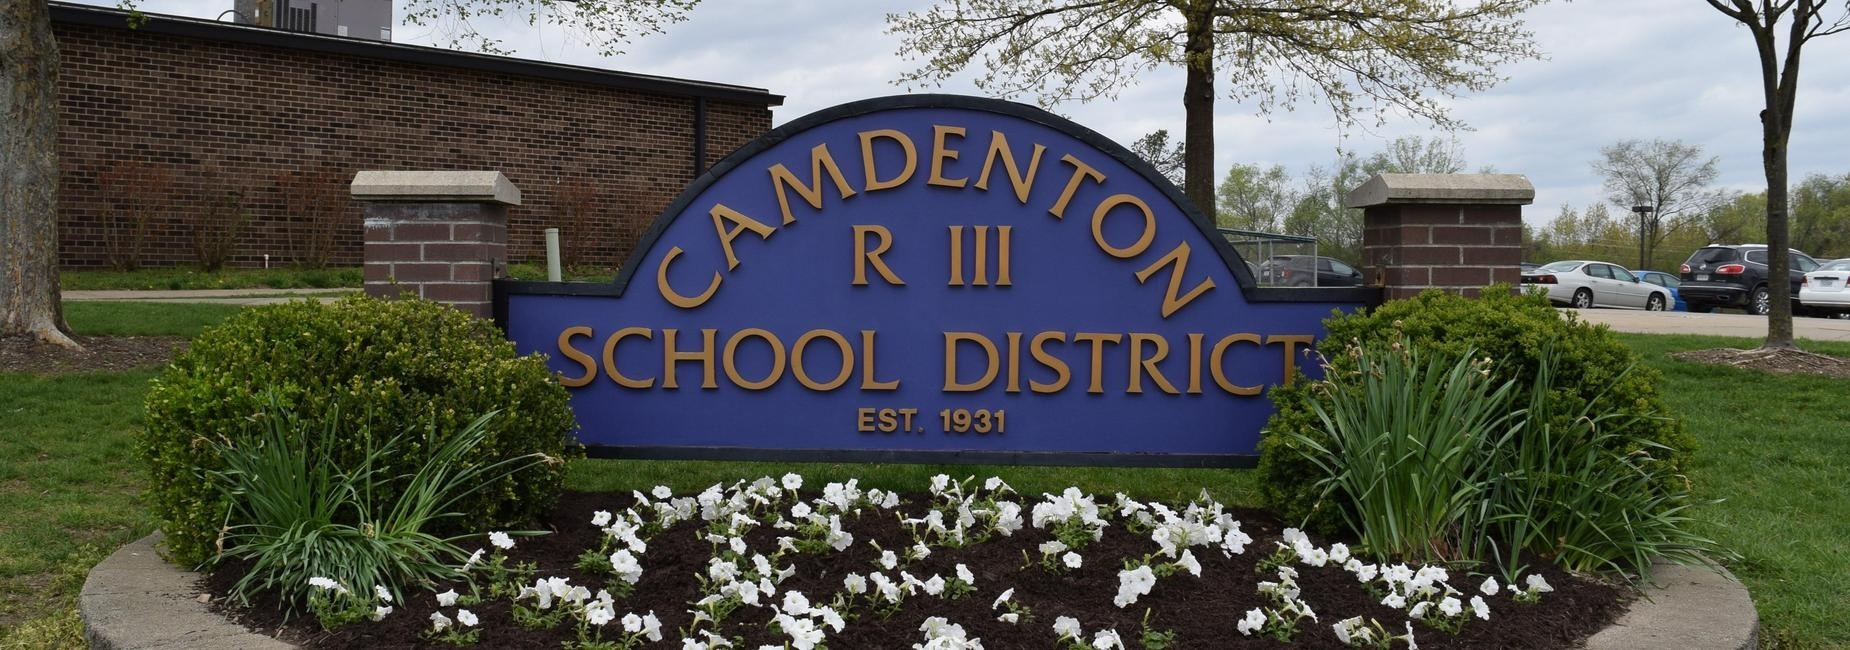 Camdenton R-Iii School District_Camdenton R 3 School Calendar